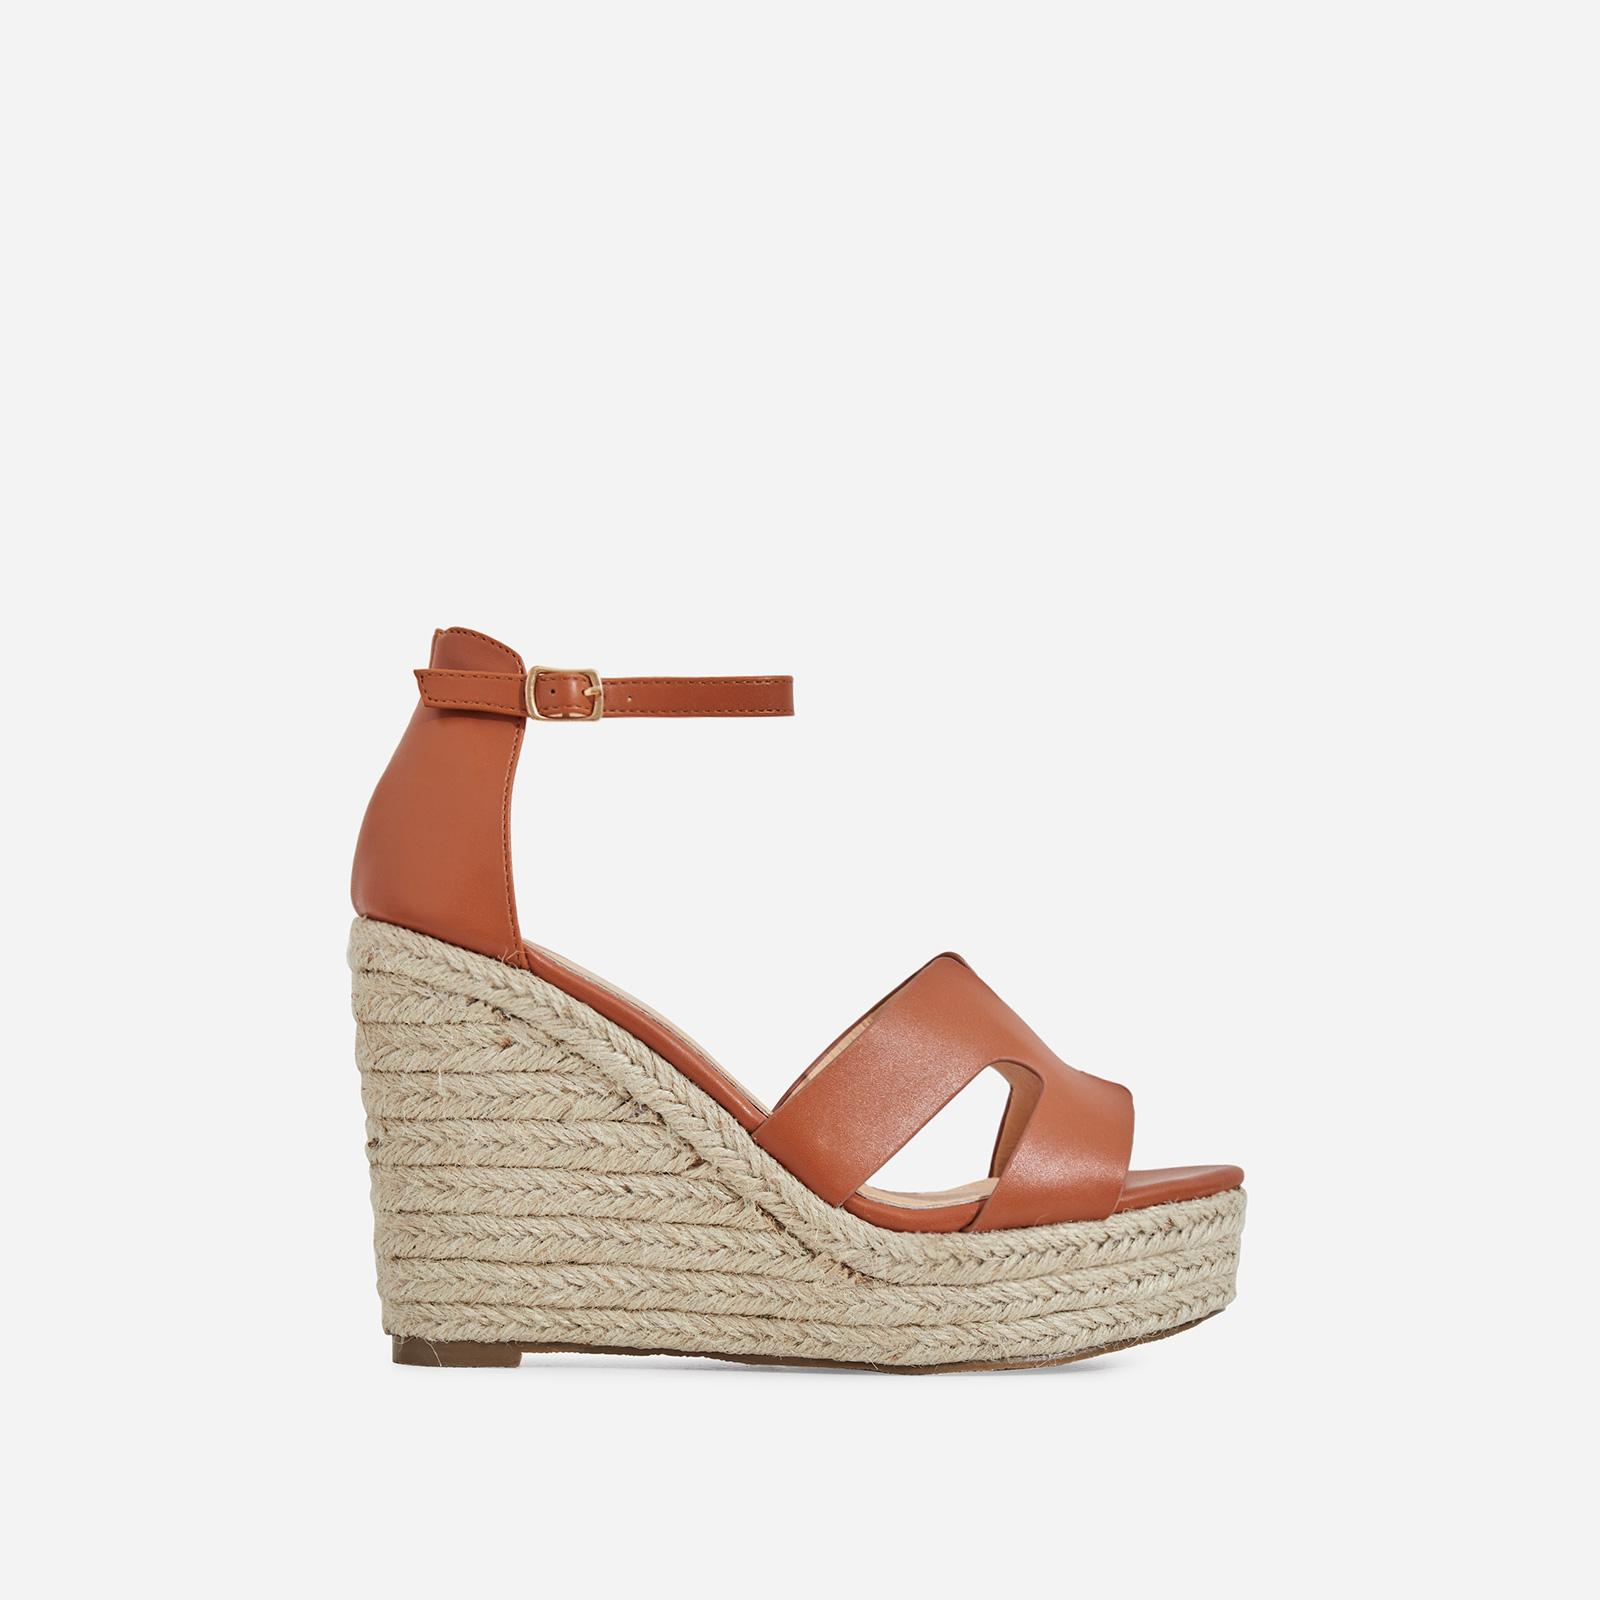 Kayson Platform Espadrille Wedge Block Heel In Tan Faux Leather